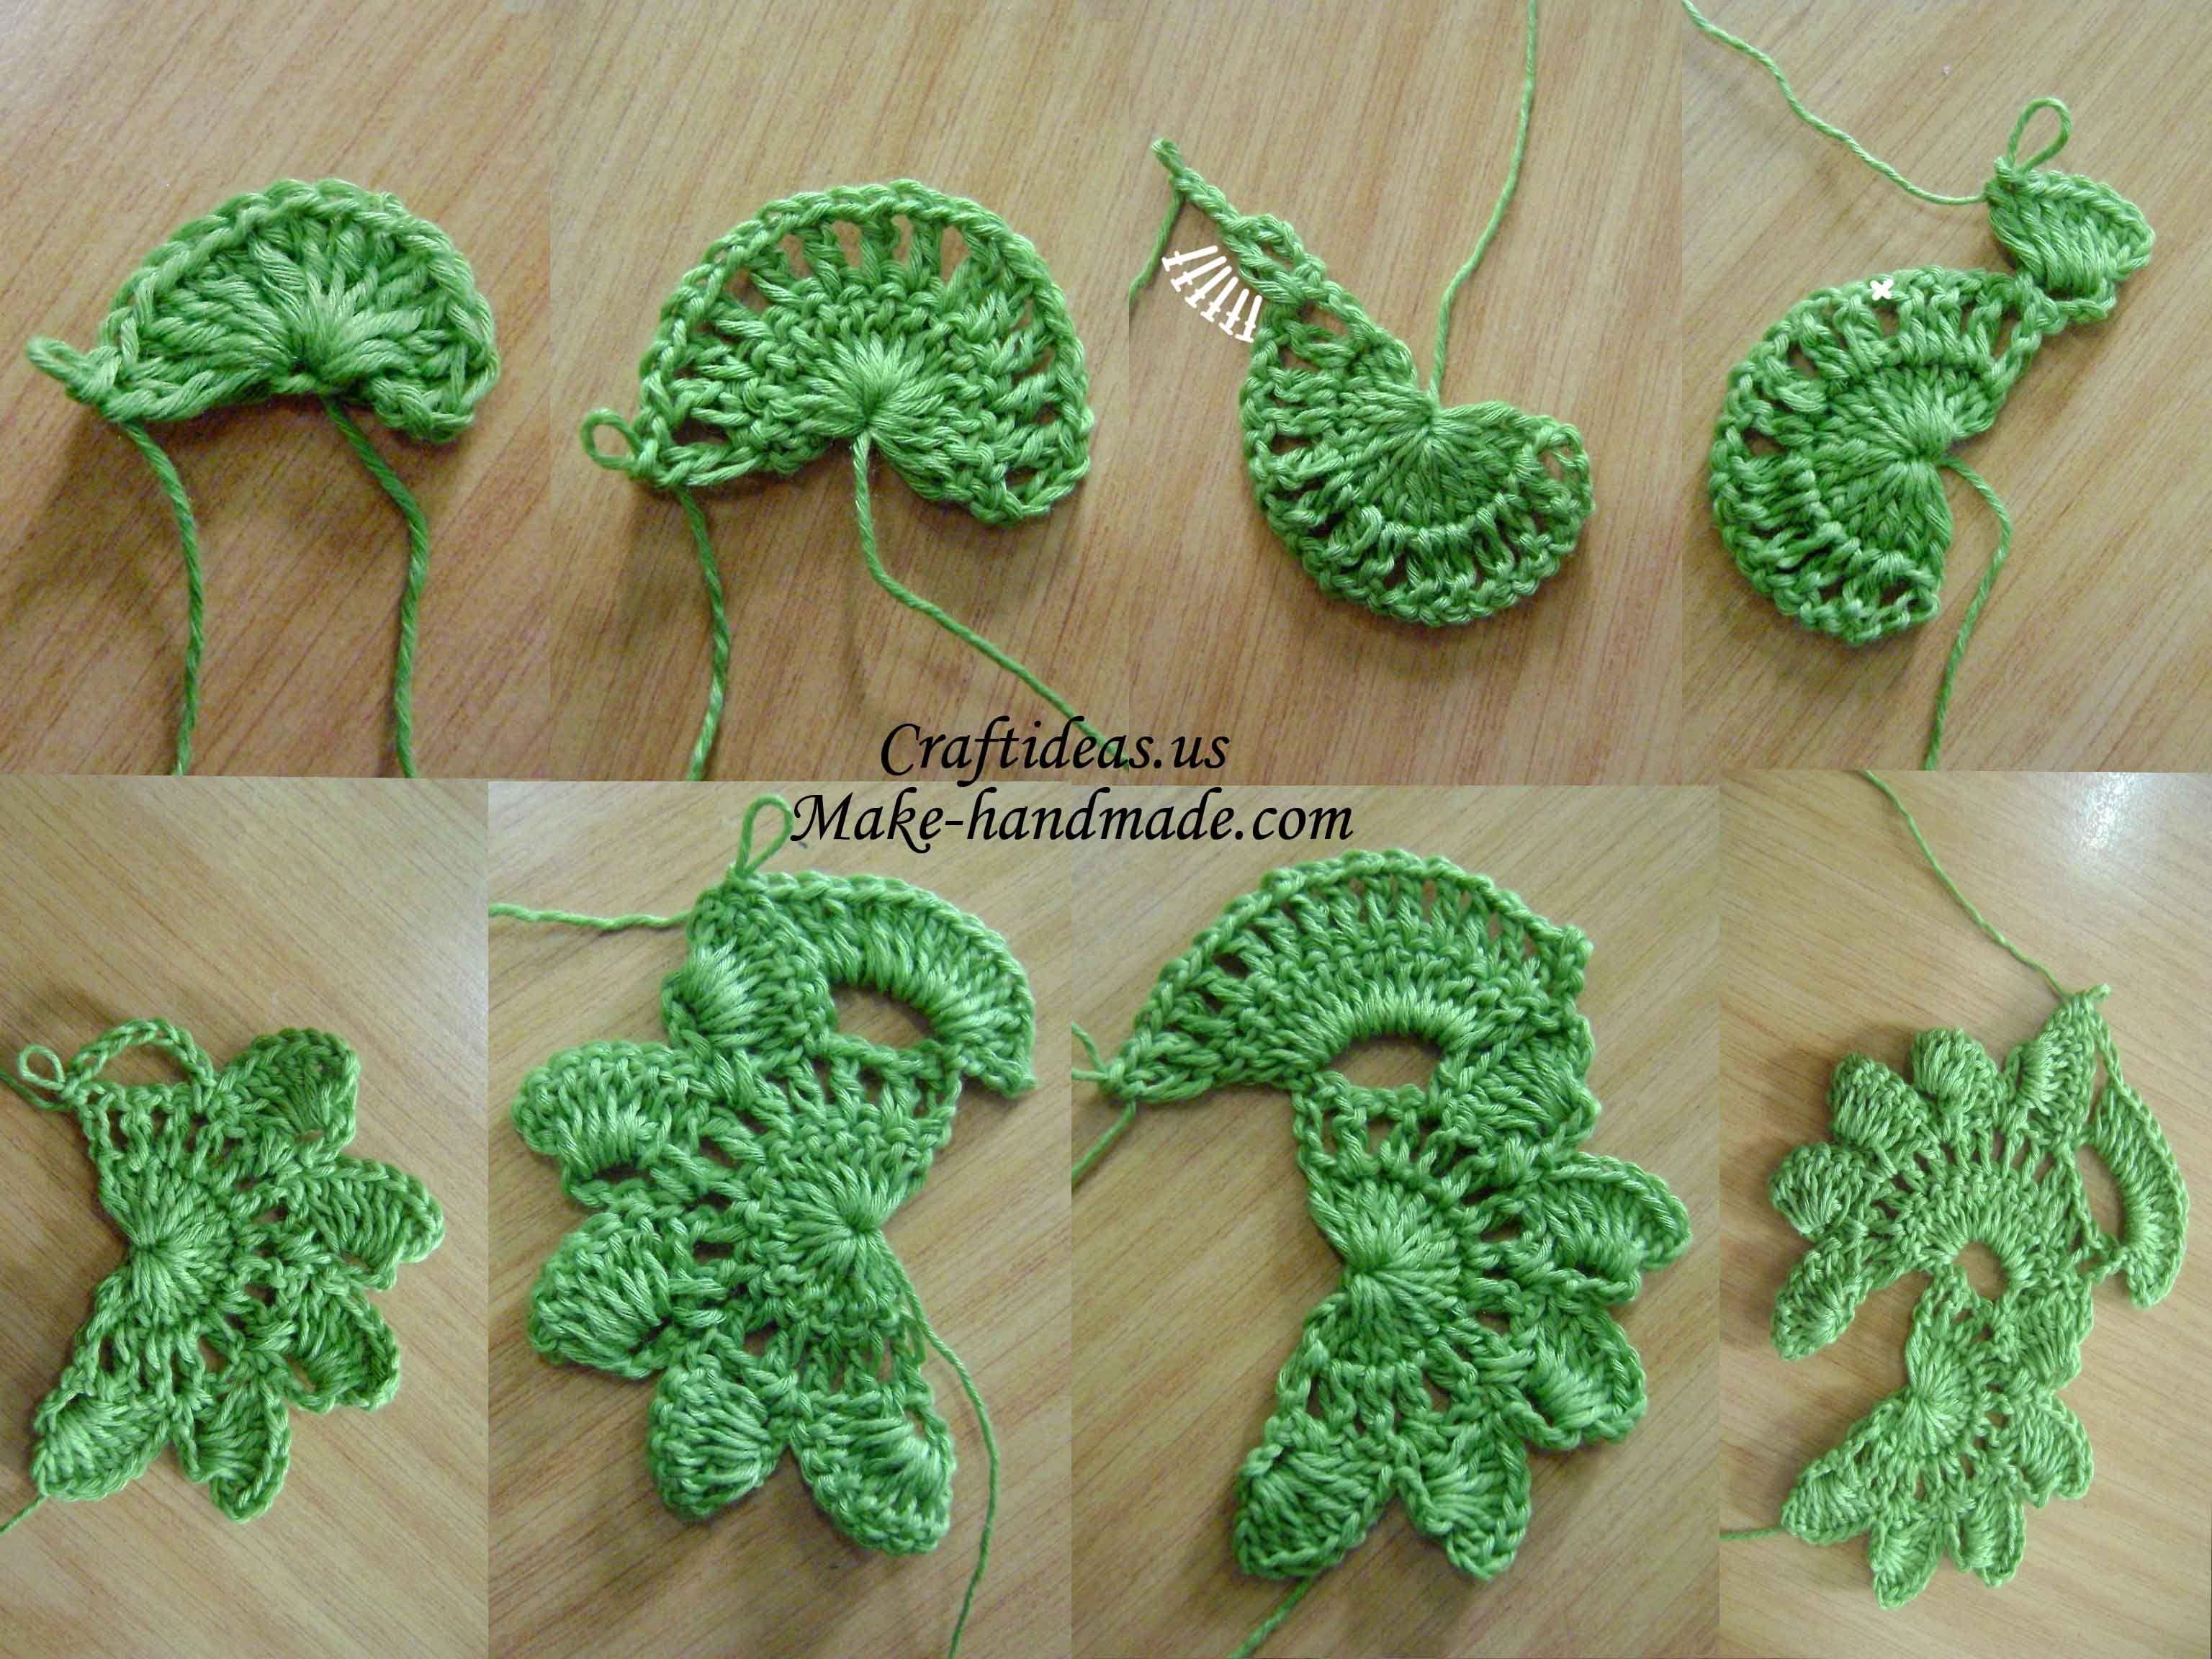 Crochet flower strip tutorialg 30722304 pixels crochet alfa img showing crochet flower tutorial step by step bankloansurffo Images